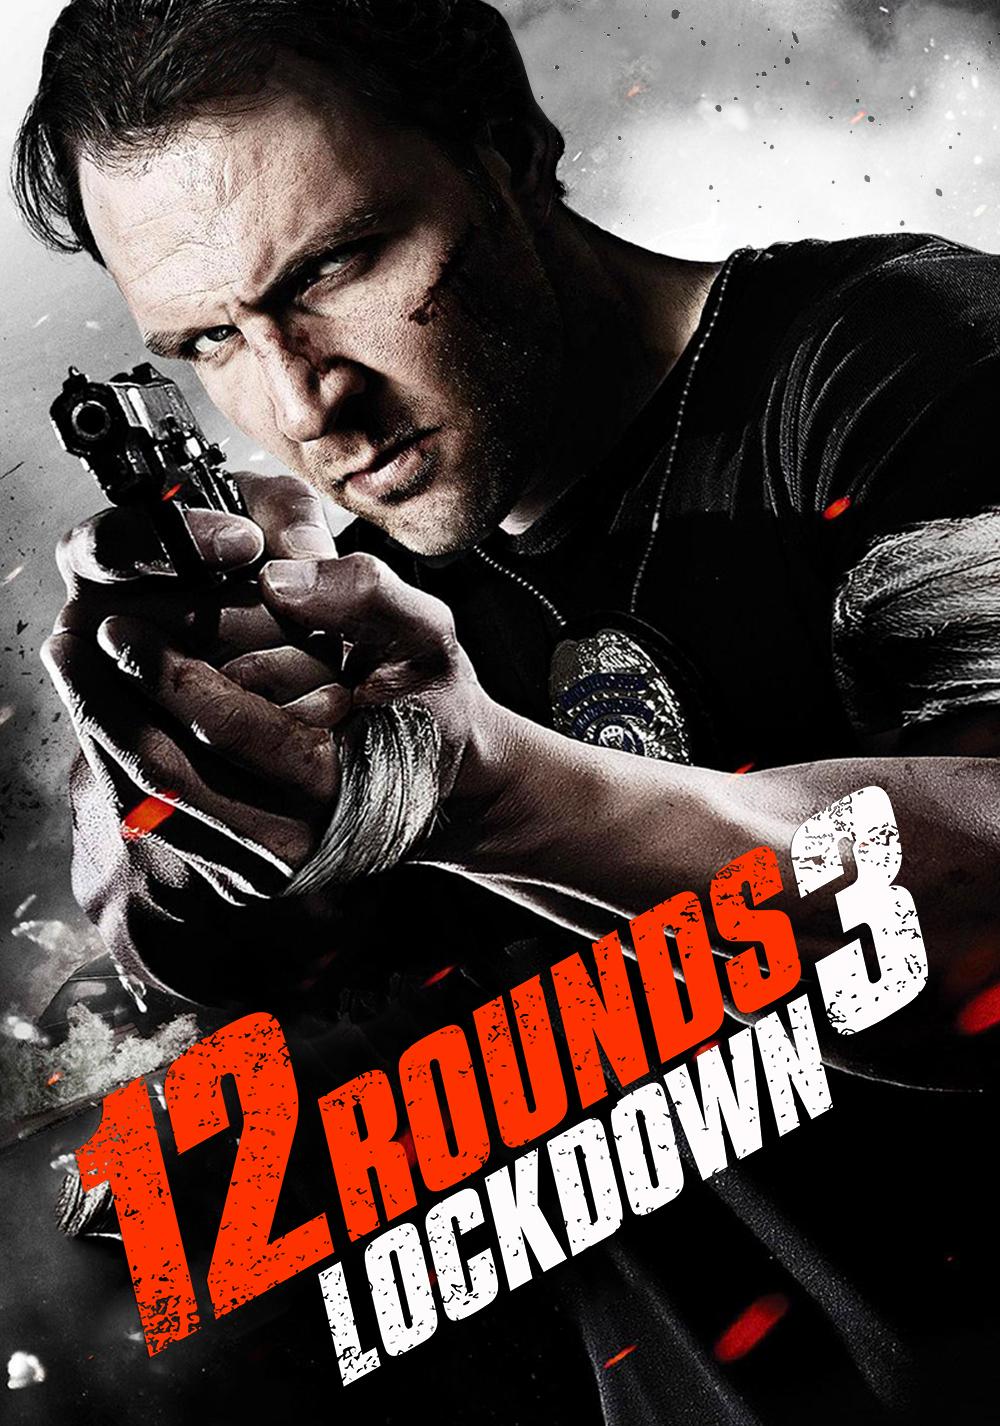 12 Rounds 3 Lockdown Movie4k